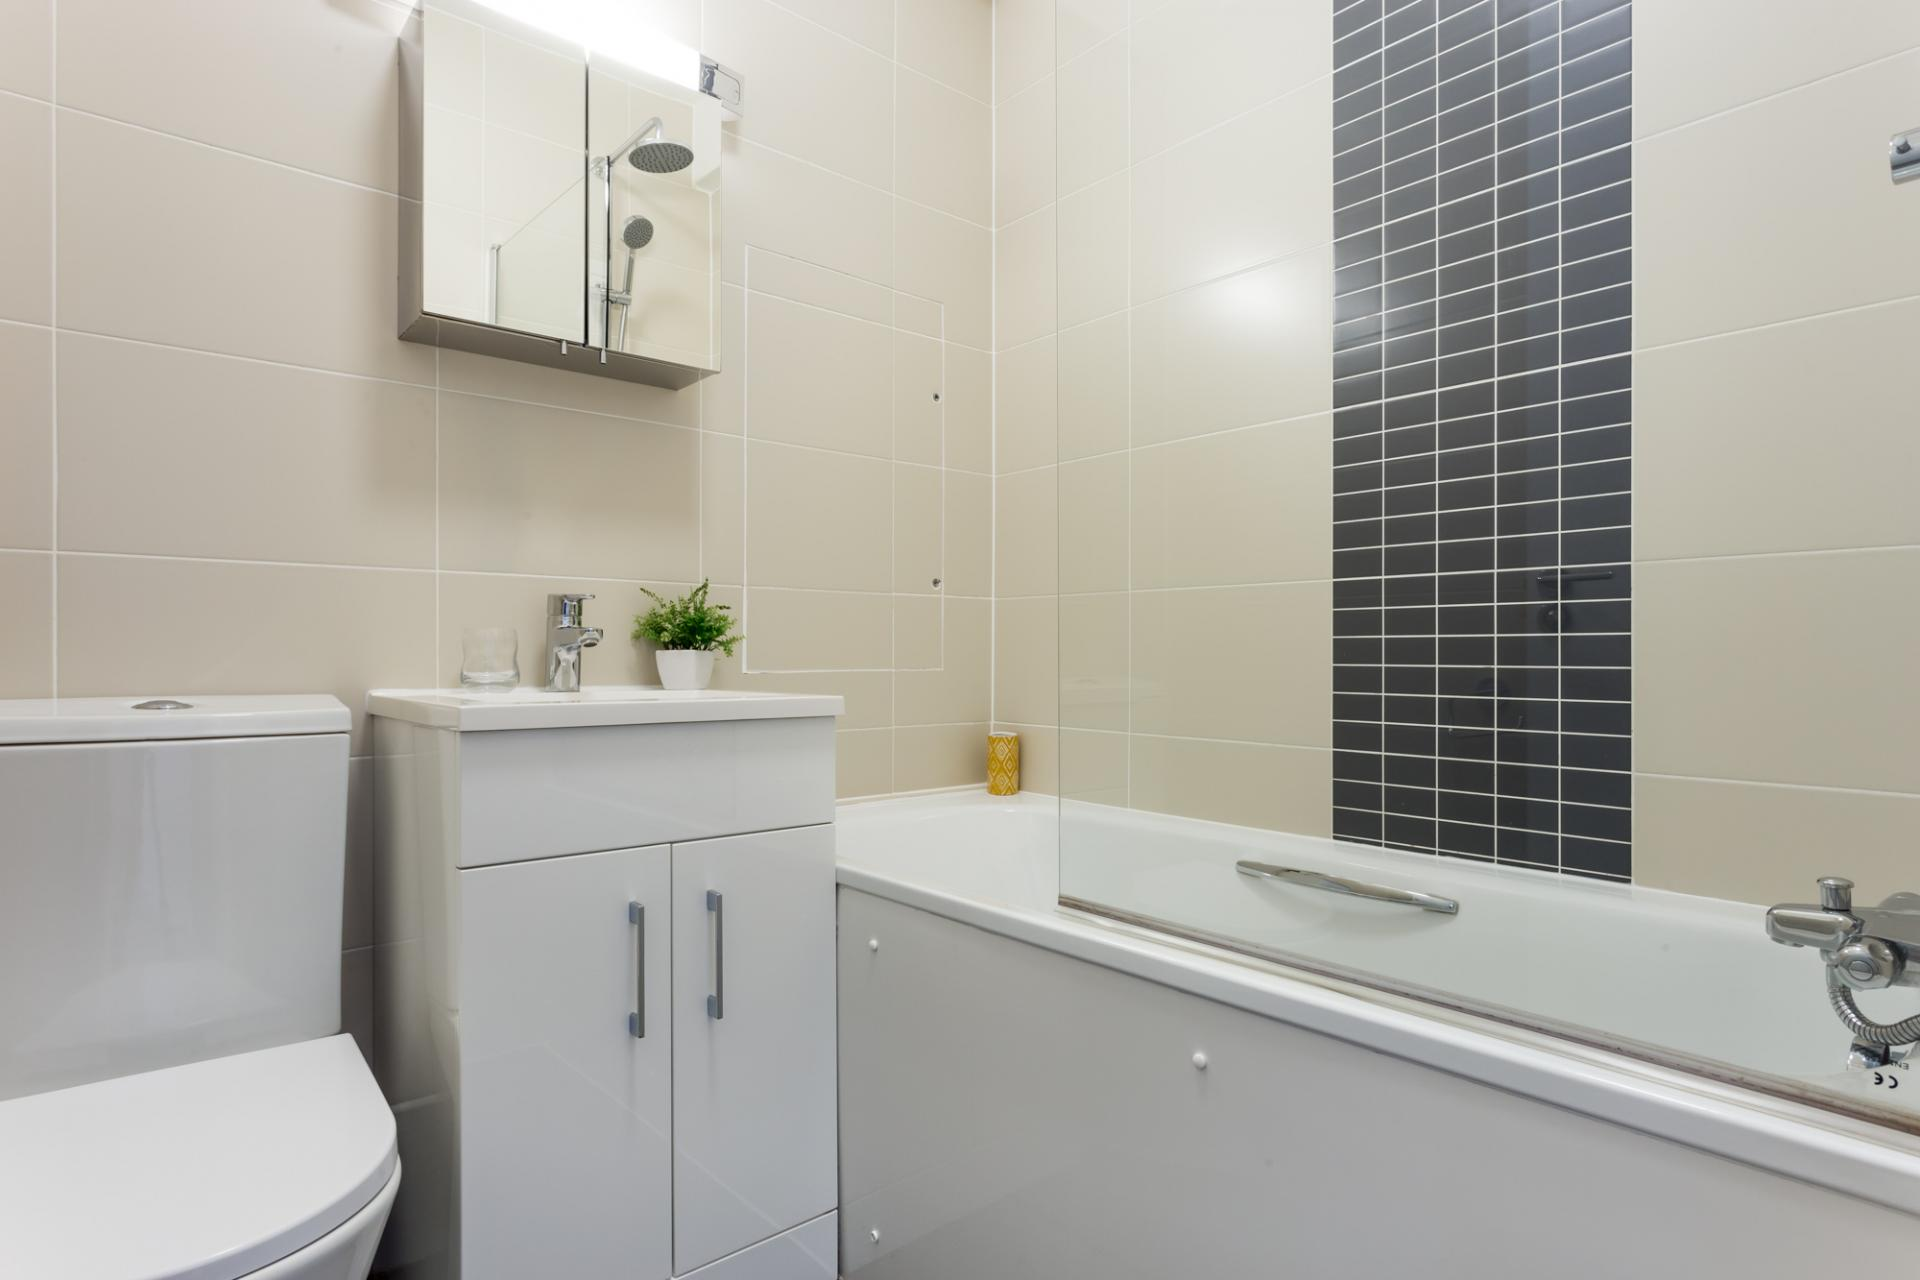 Bathroom - Dolphin Square, Pimlico, London - Citybase Apartments